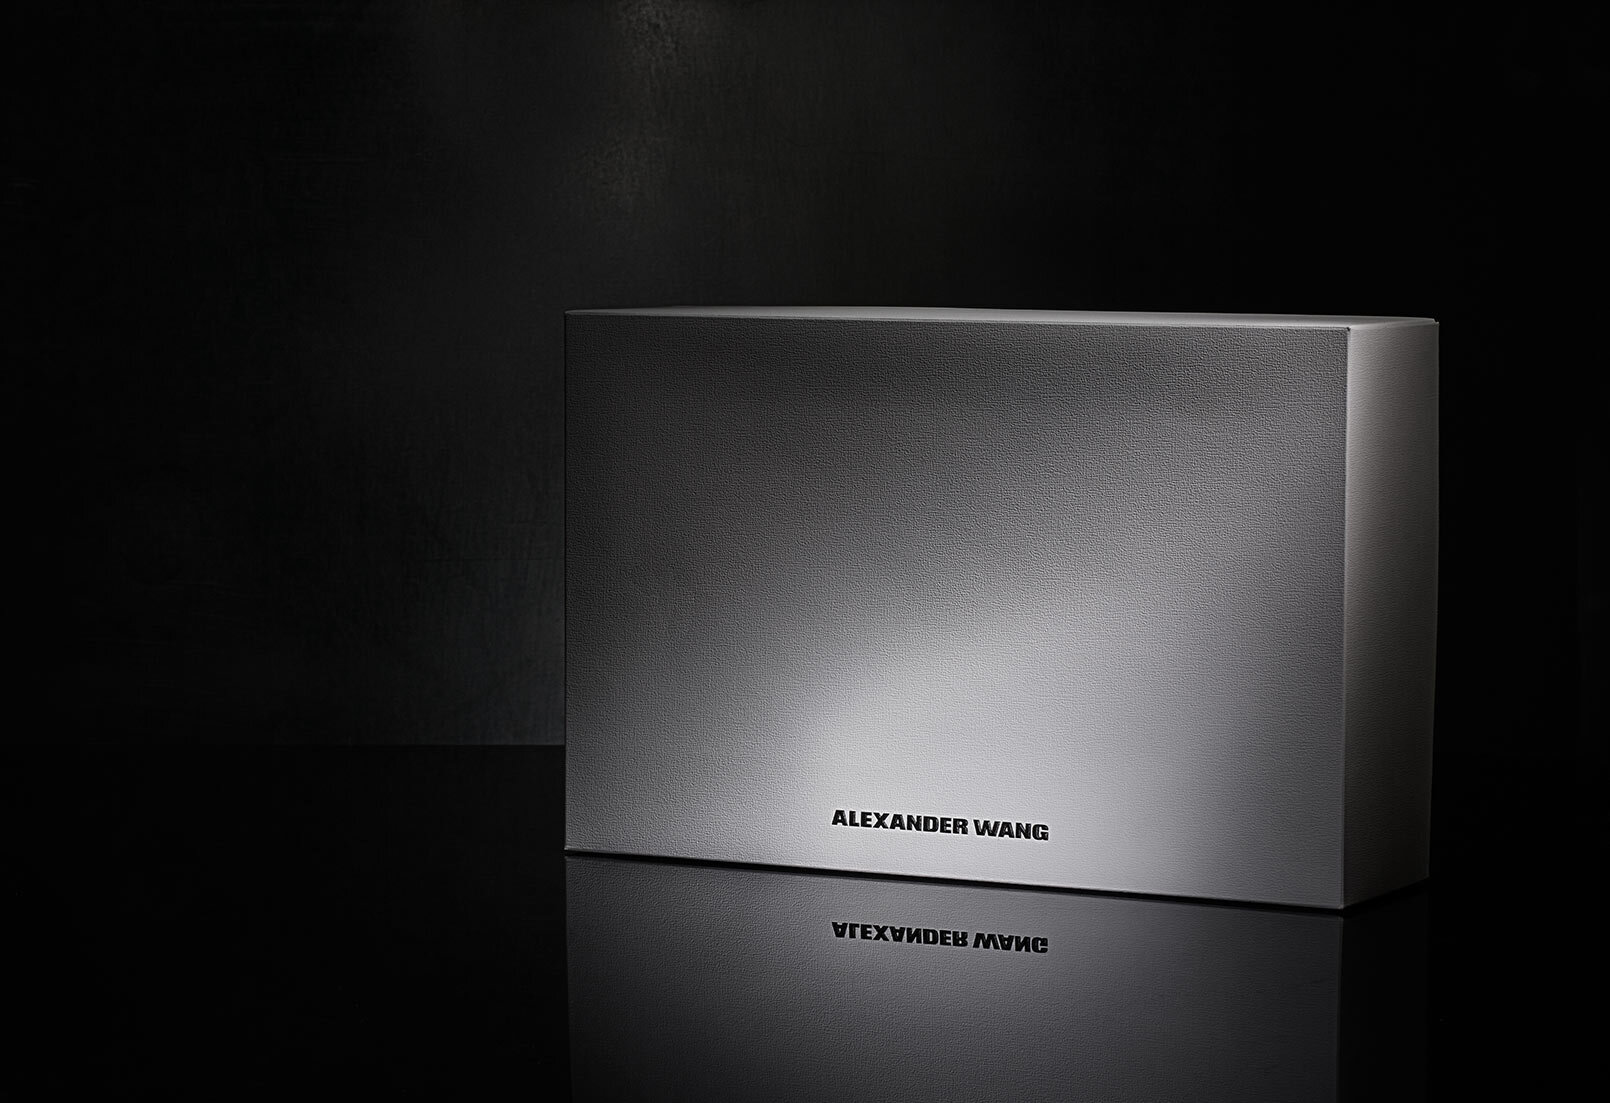 Alexander-Wang-Box-Design-Packaging-Company-1.1.jpg